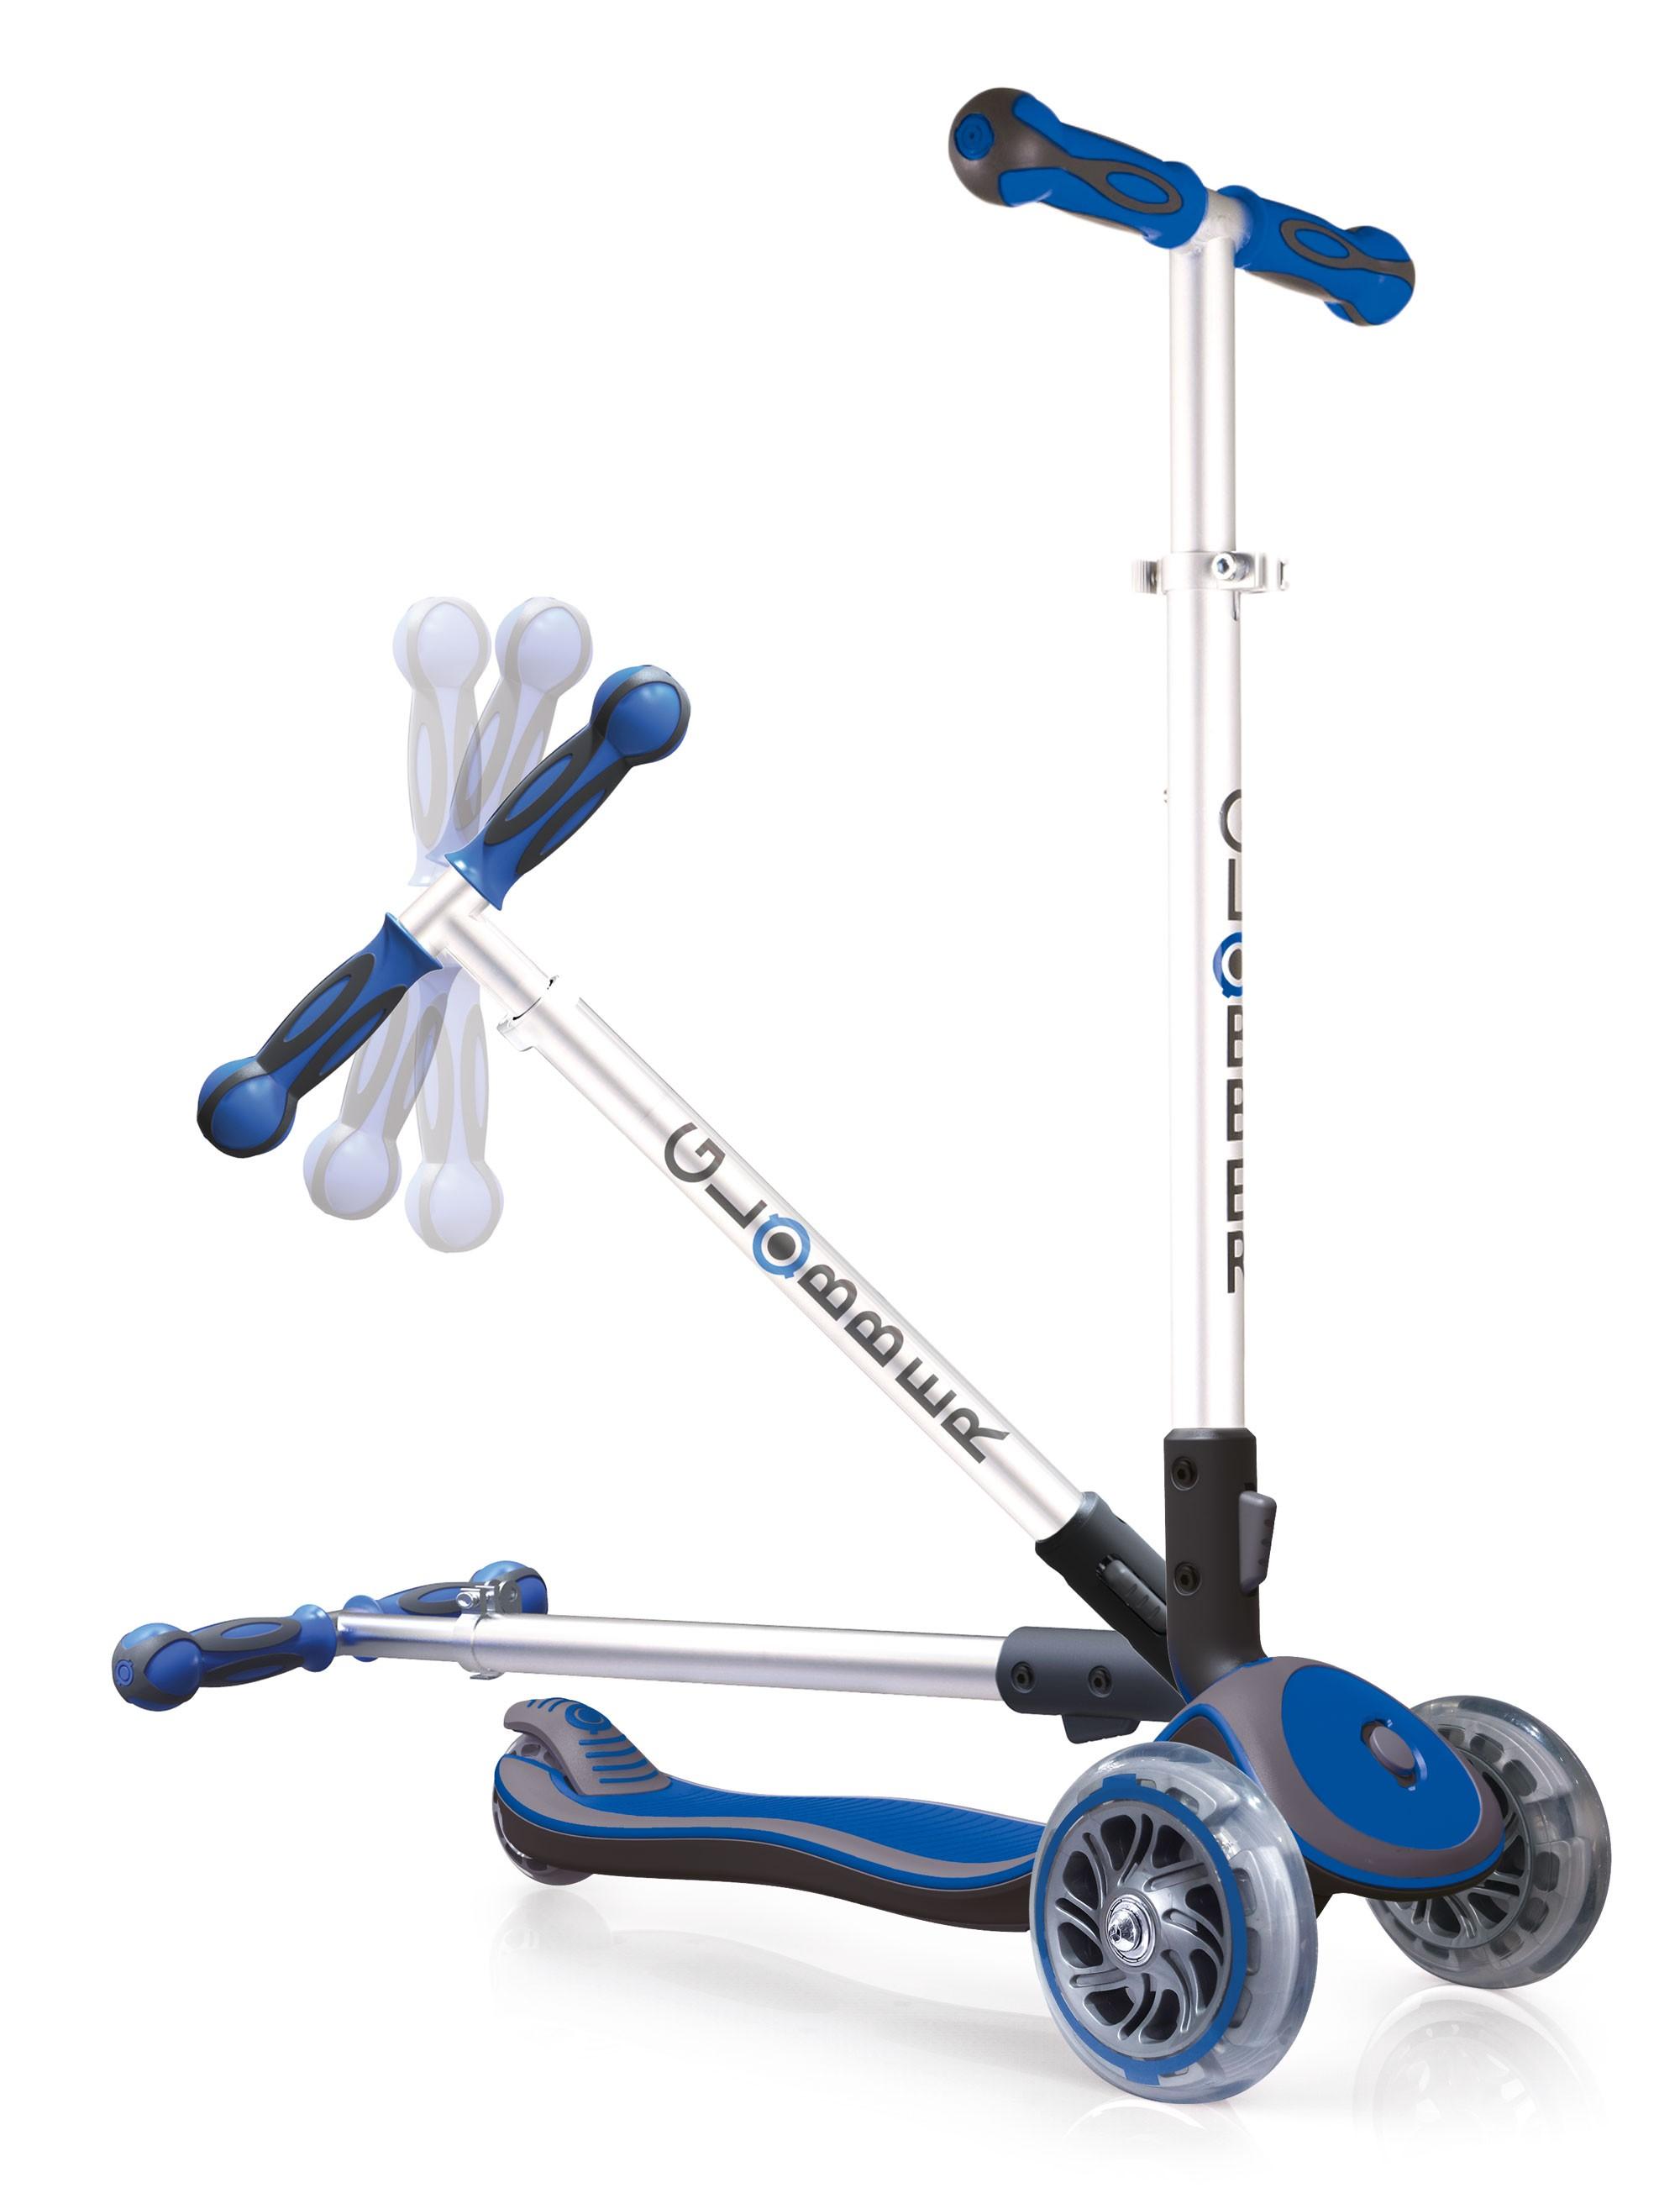 Scooter / Kinderroller Globber MY FREE Fold UP blau-grau Bild 3